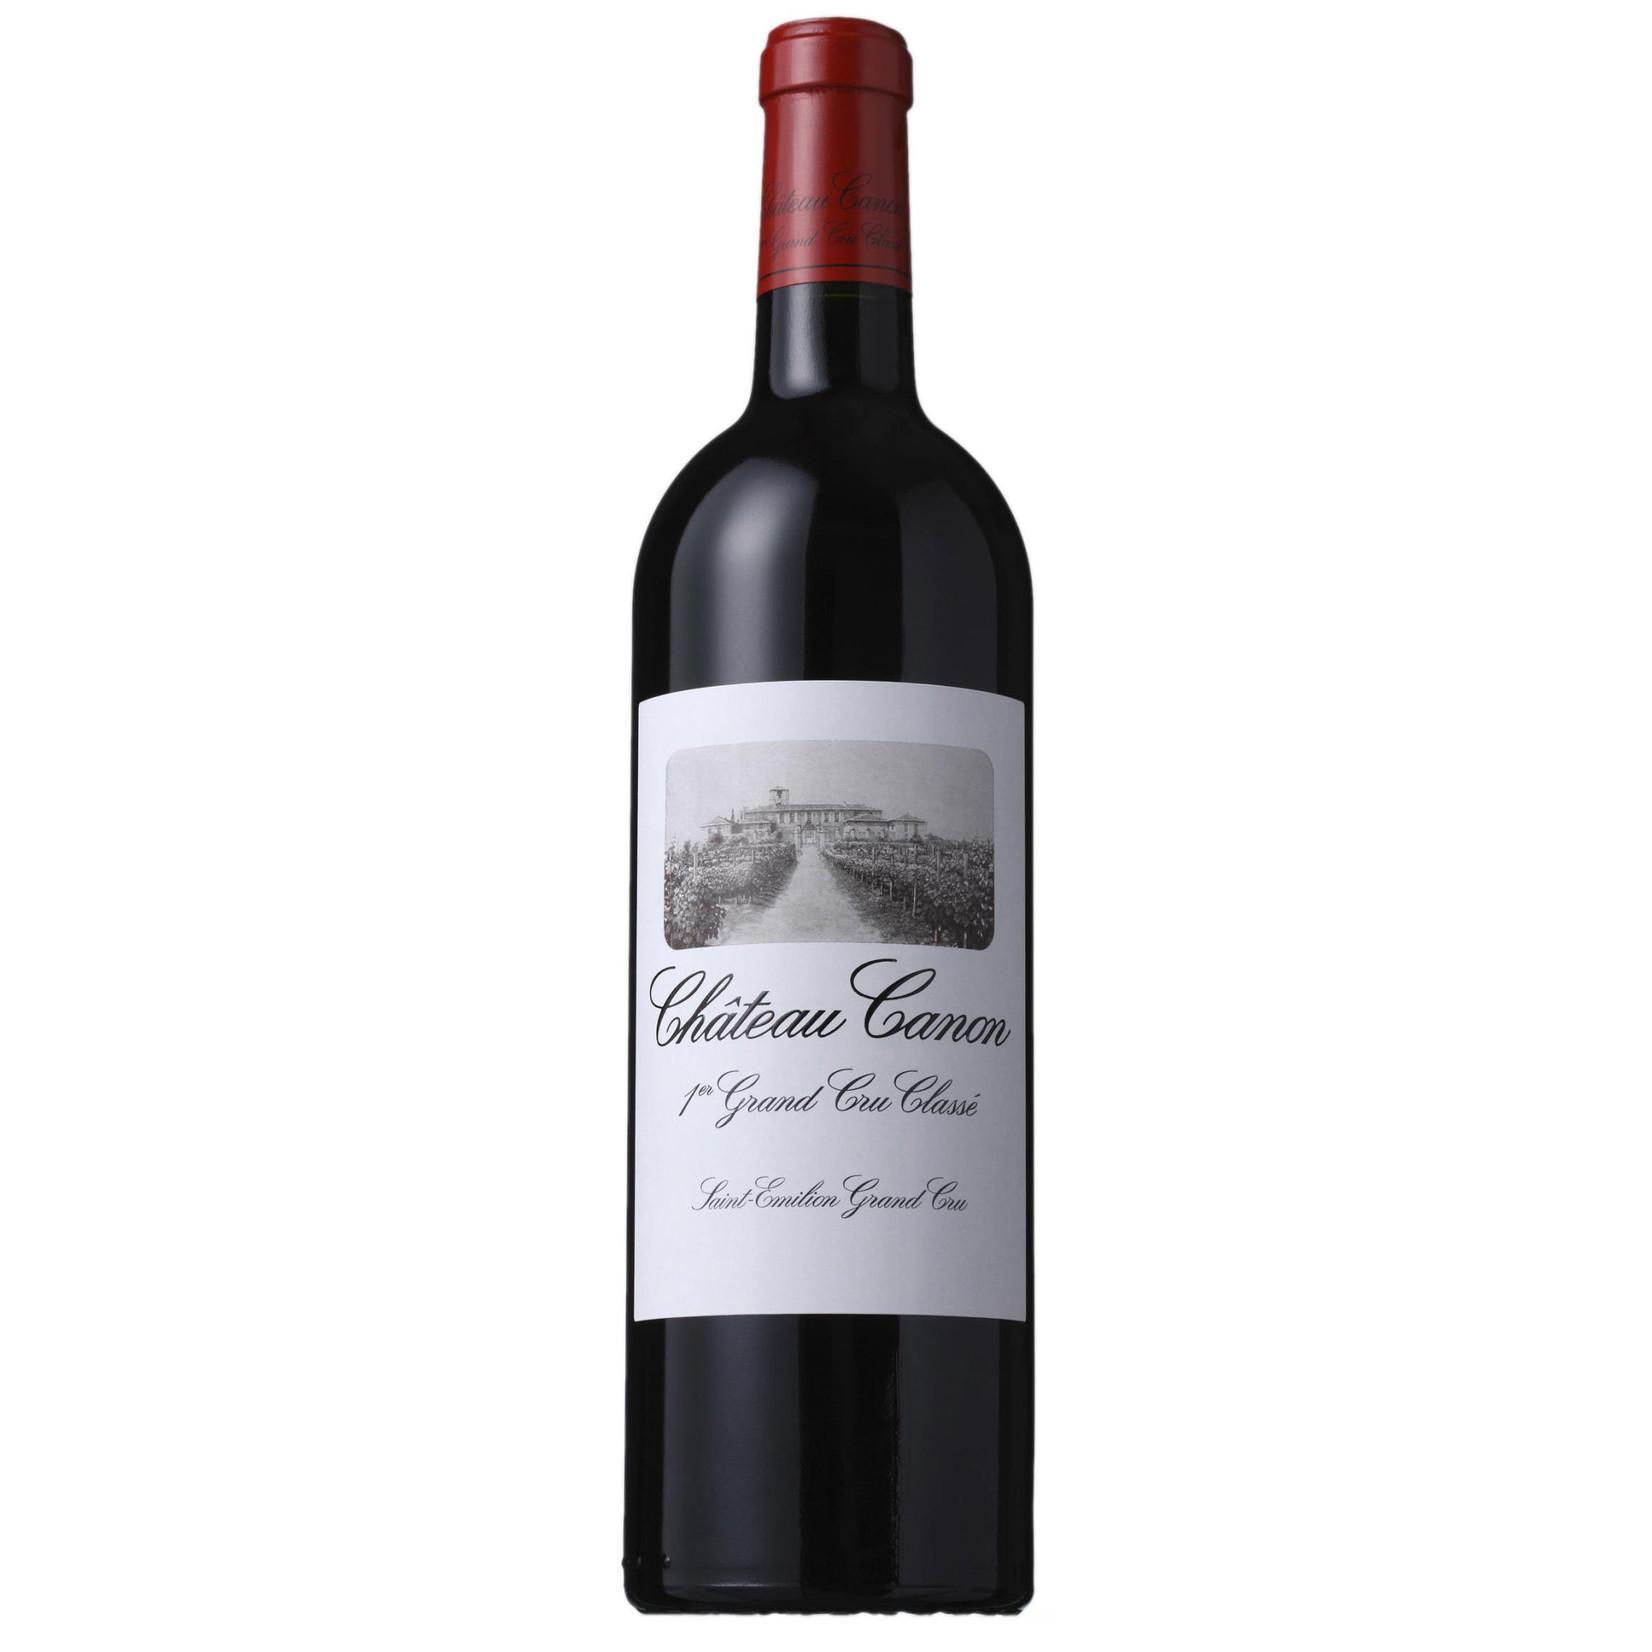 Wine Chateau Canon Saint Emilion 2015